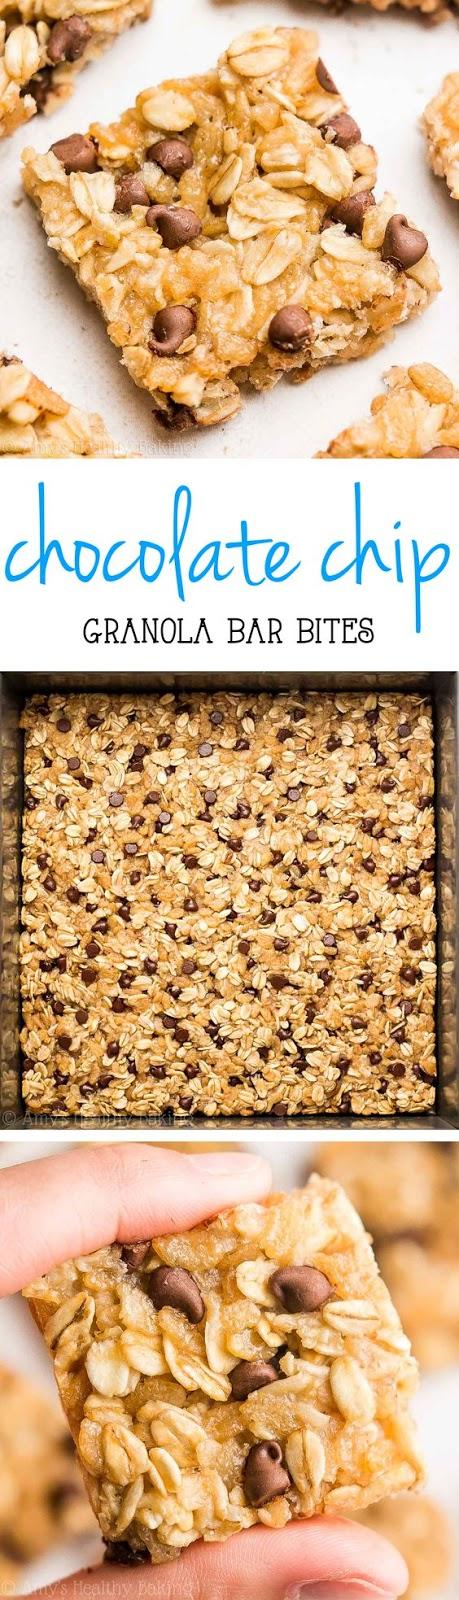 Chocolate Chip Granola Bar Bites